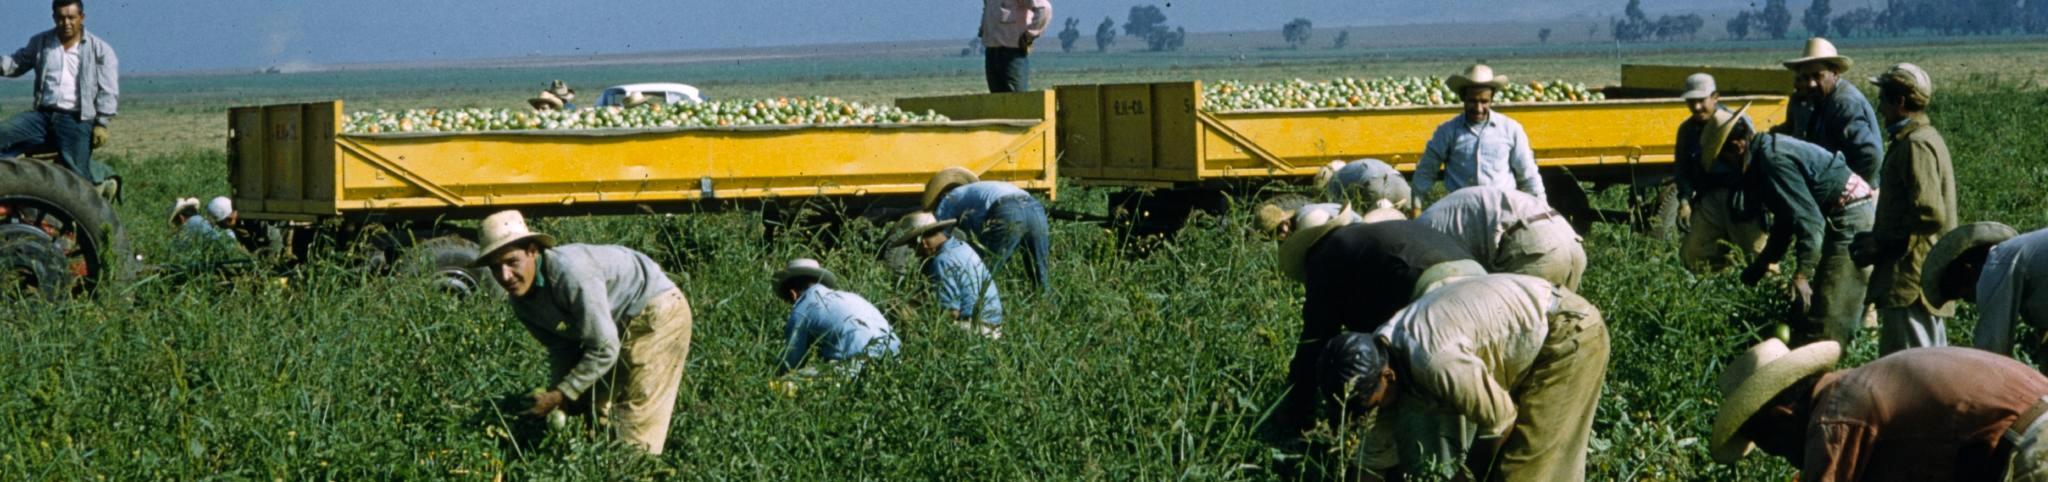 Tomato harvesting by hand, California, 1958